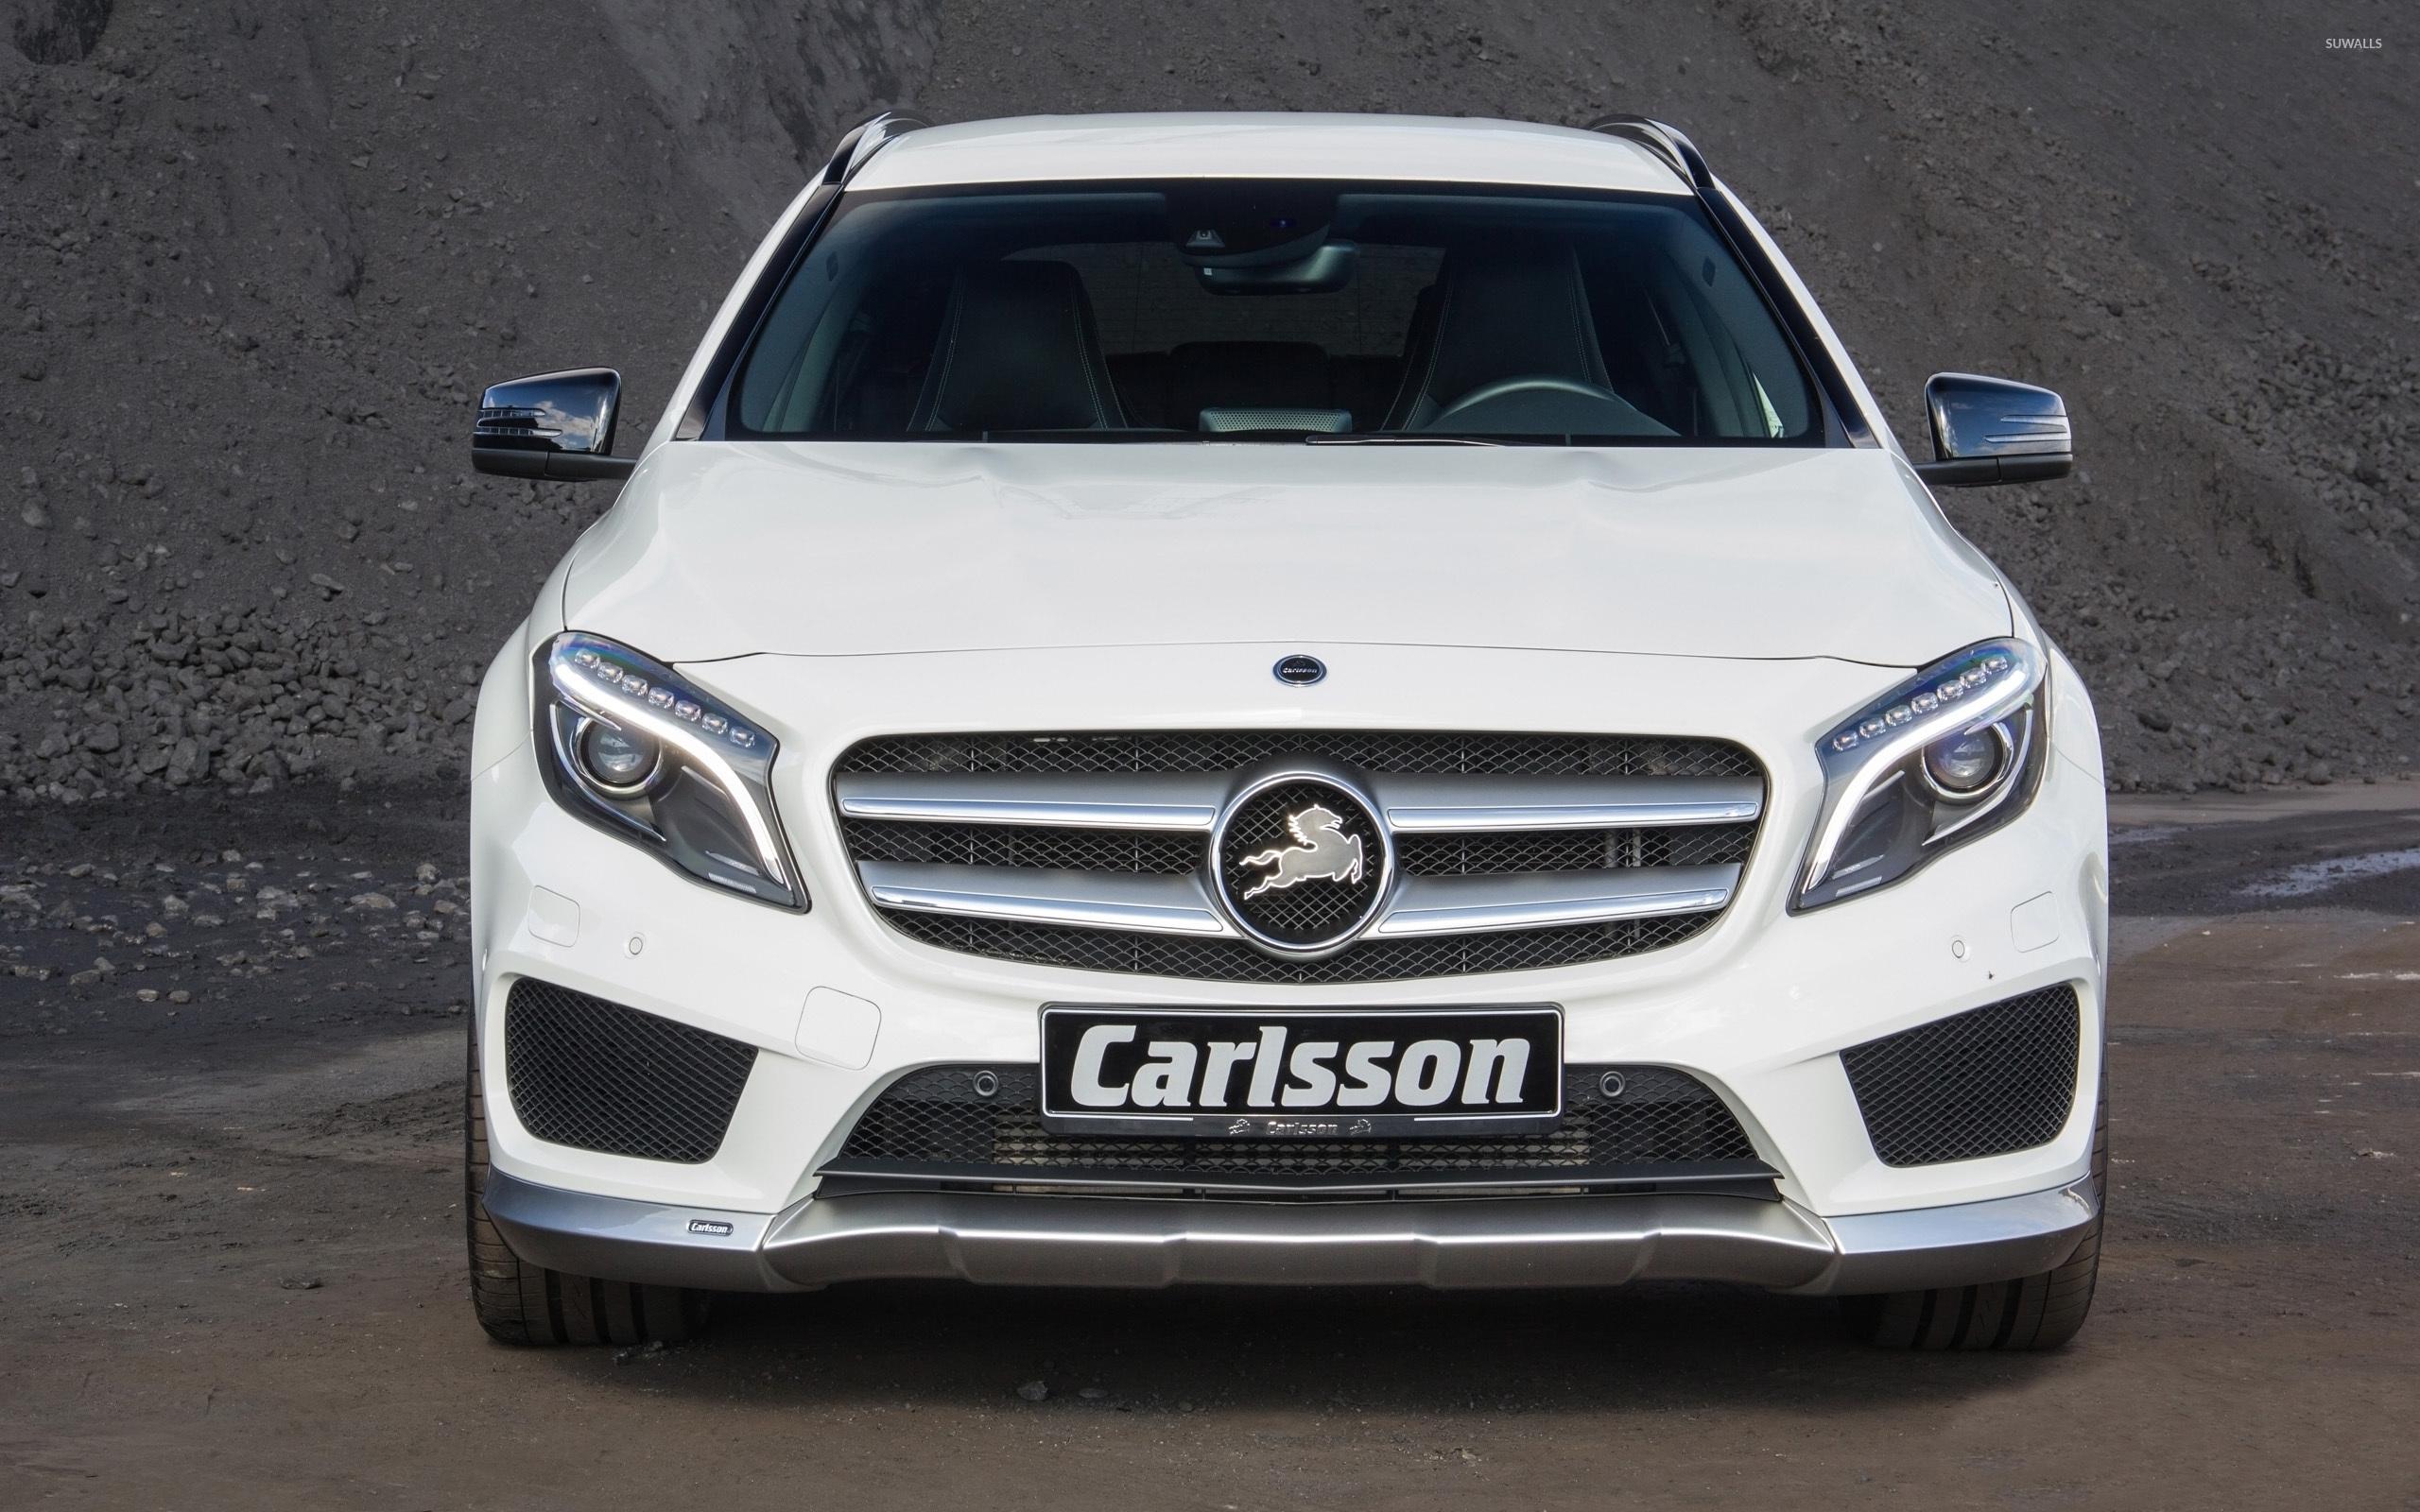 White 2014 carlsson mercedes benz gla class front view for 2014 mercedes benz gla class